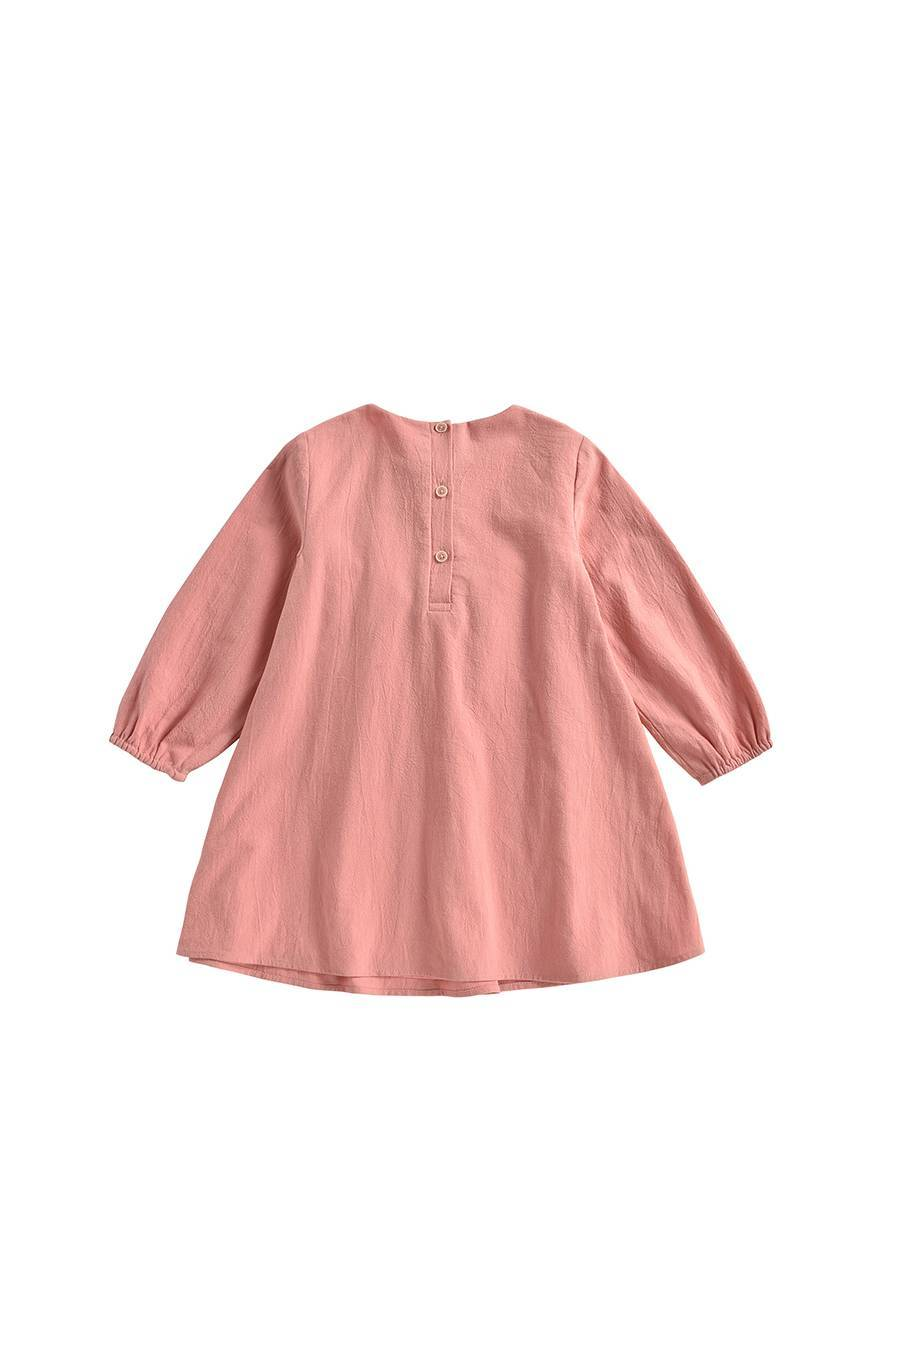 boheme chic vintage robe bébé fille maien sienna